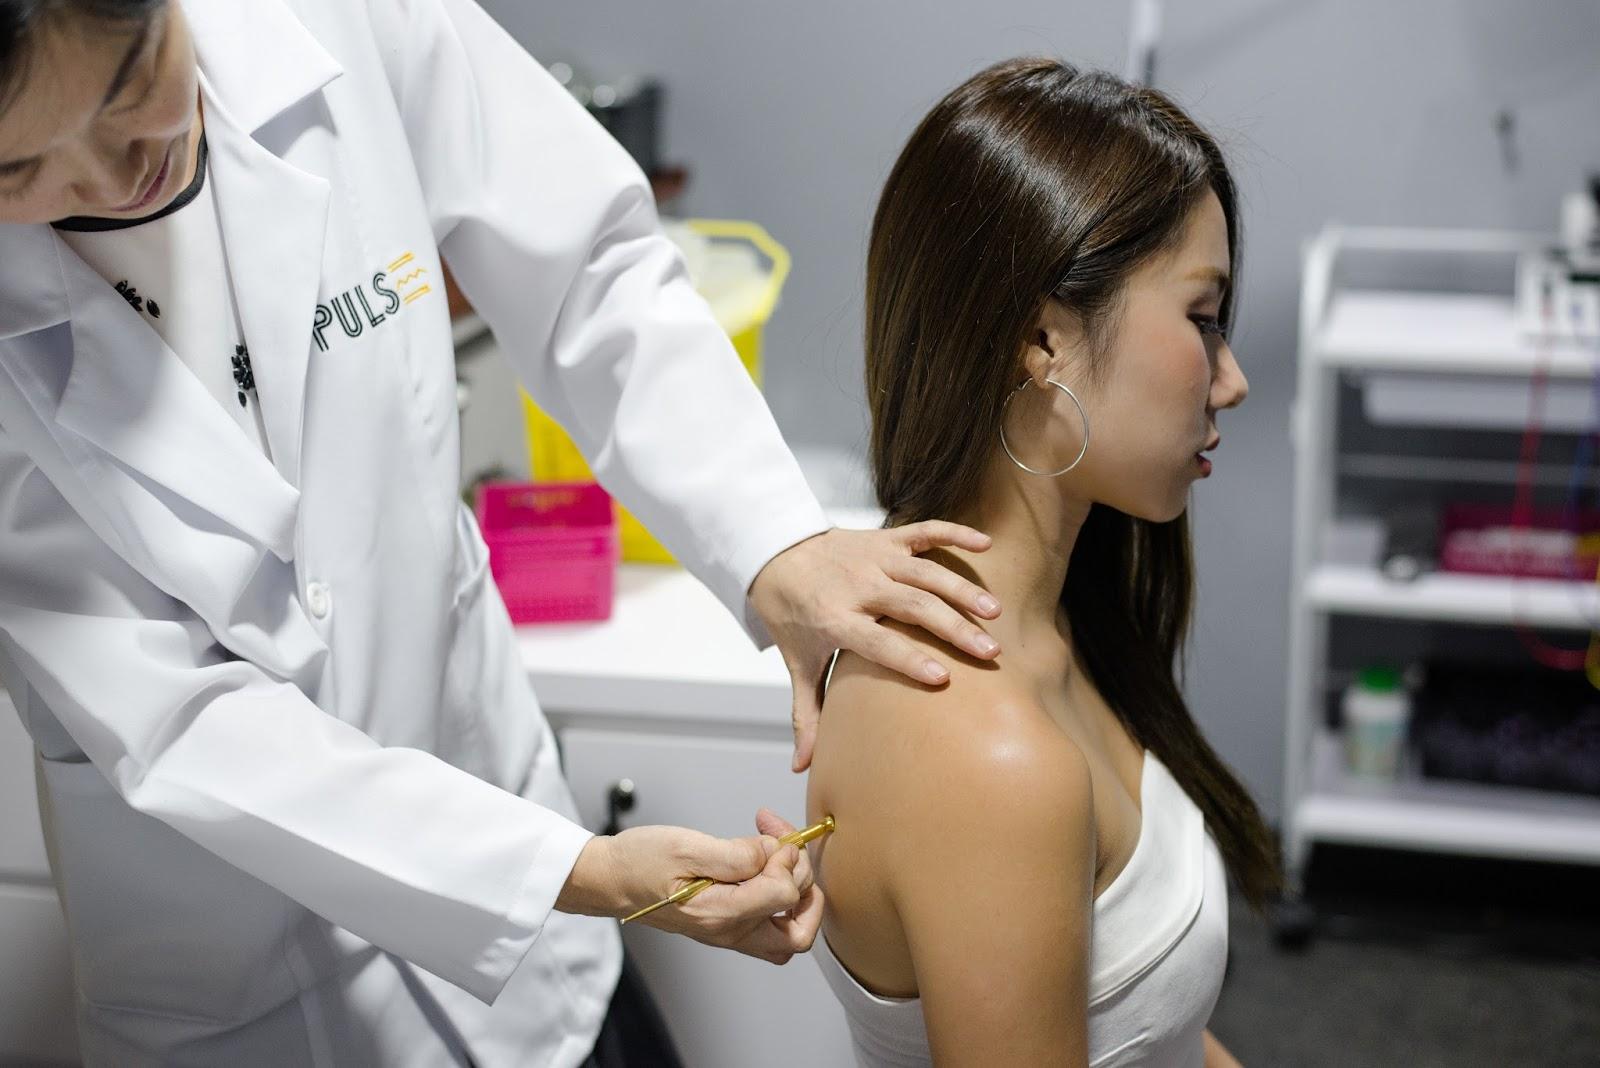 rounded shoulders, acupuncture, tcm, PULSE TCM